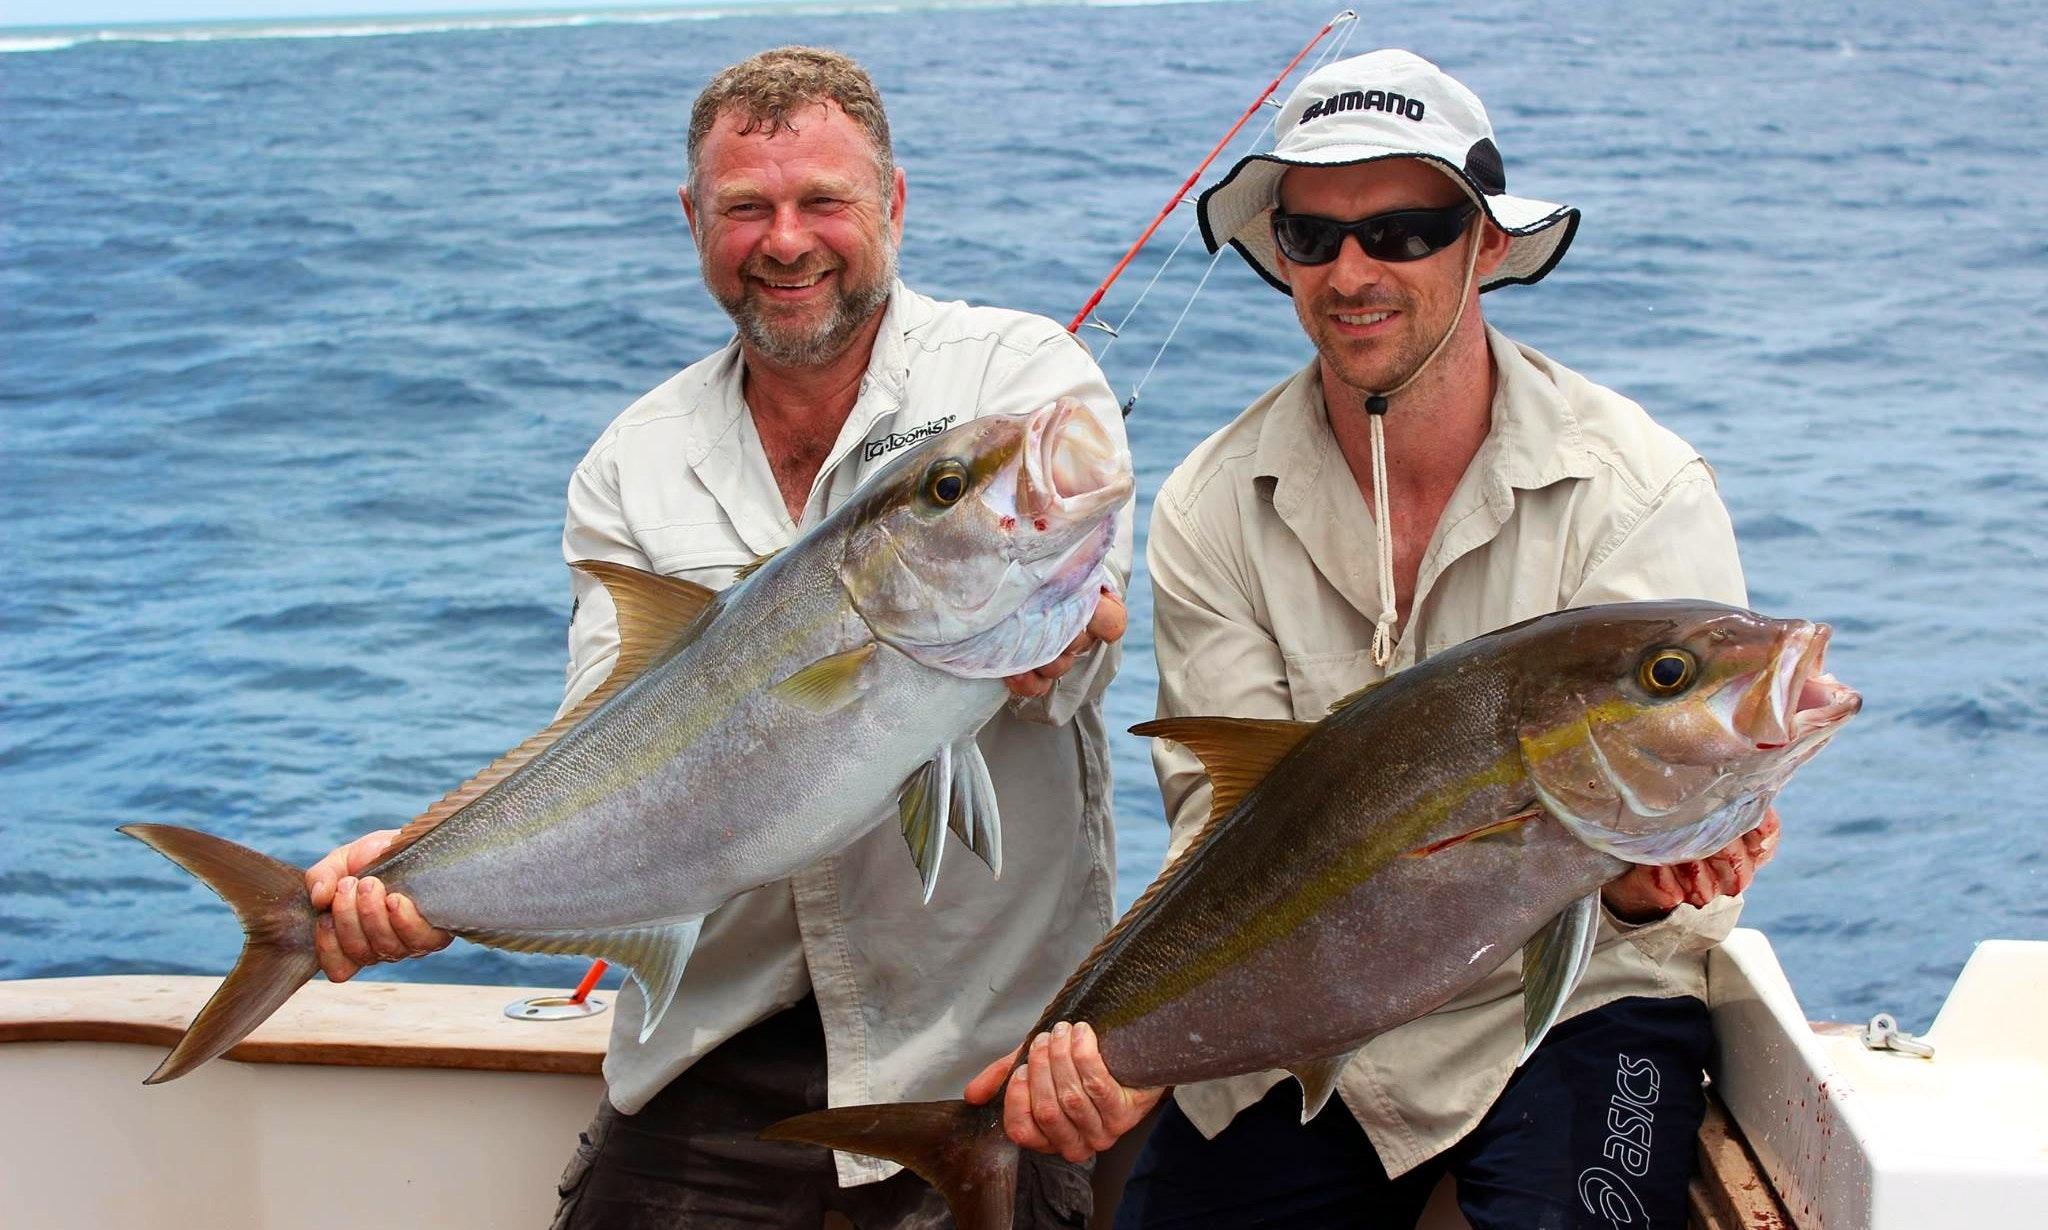 Enjoy Fishing in Werribee, South Victoria on Sport Fisherman | GetMyBoat